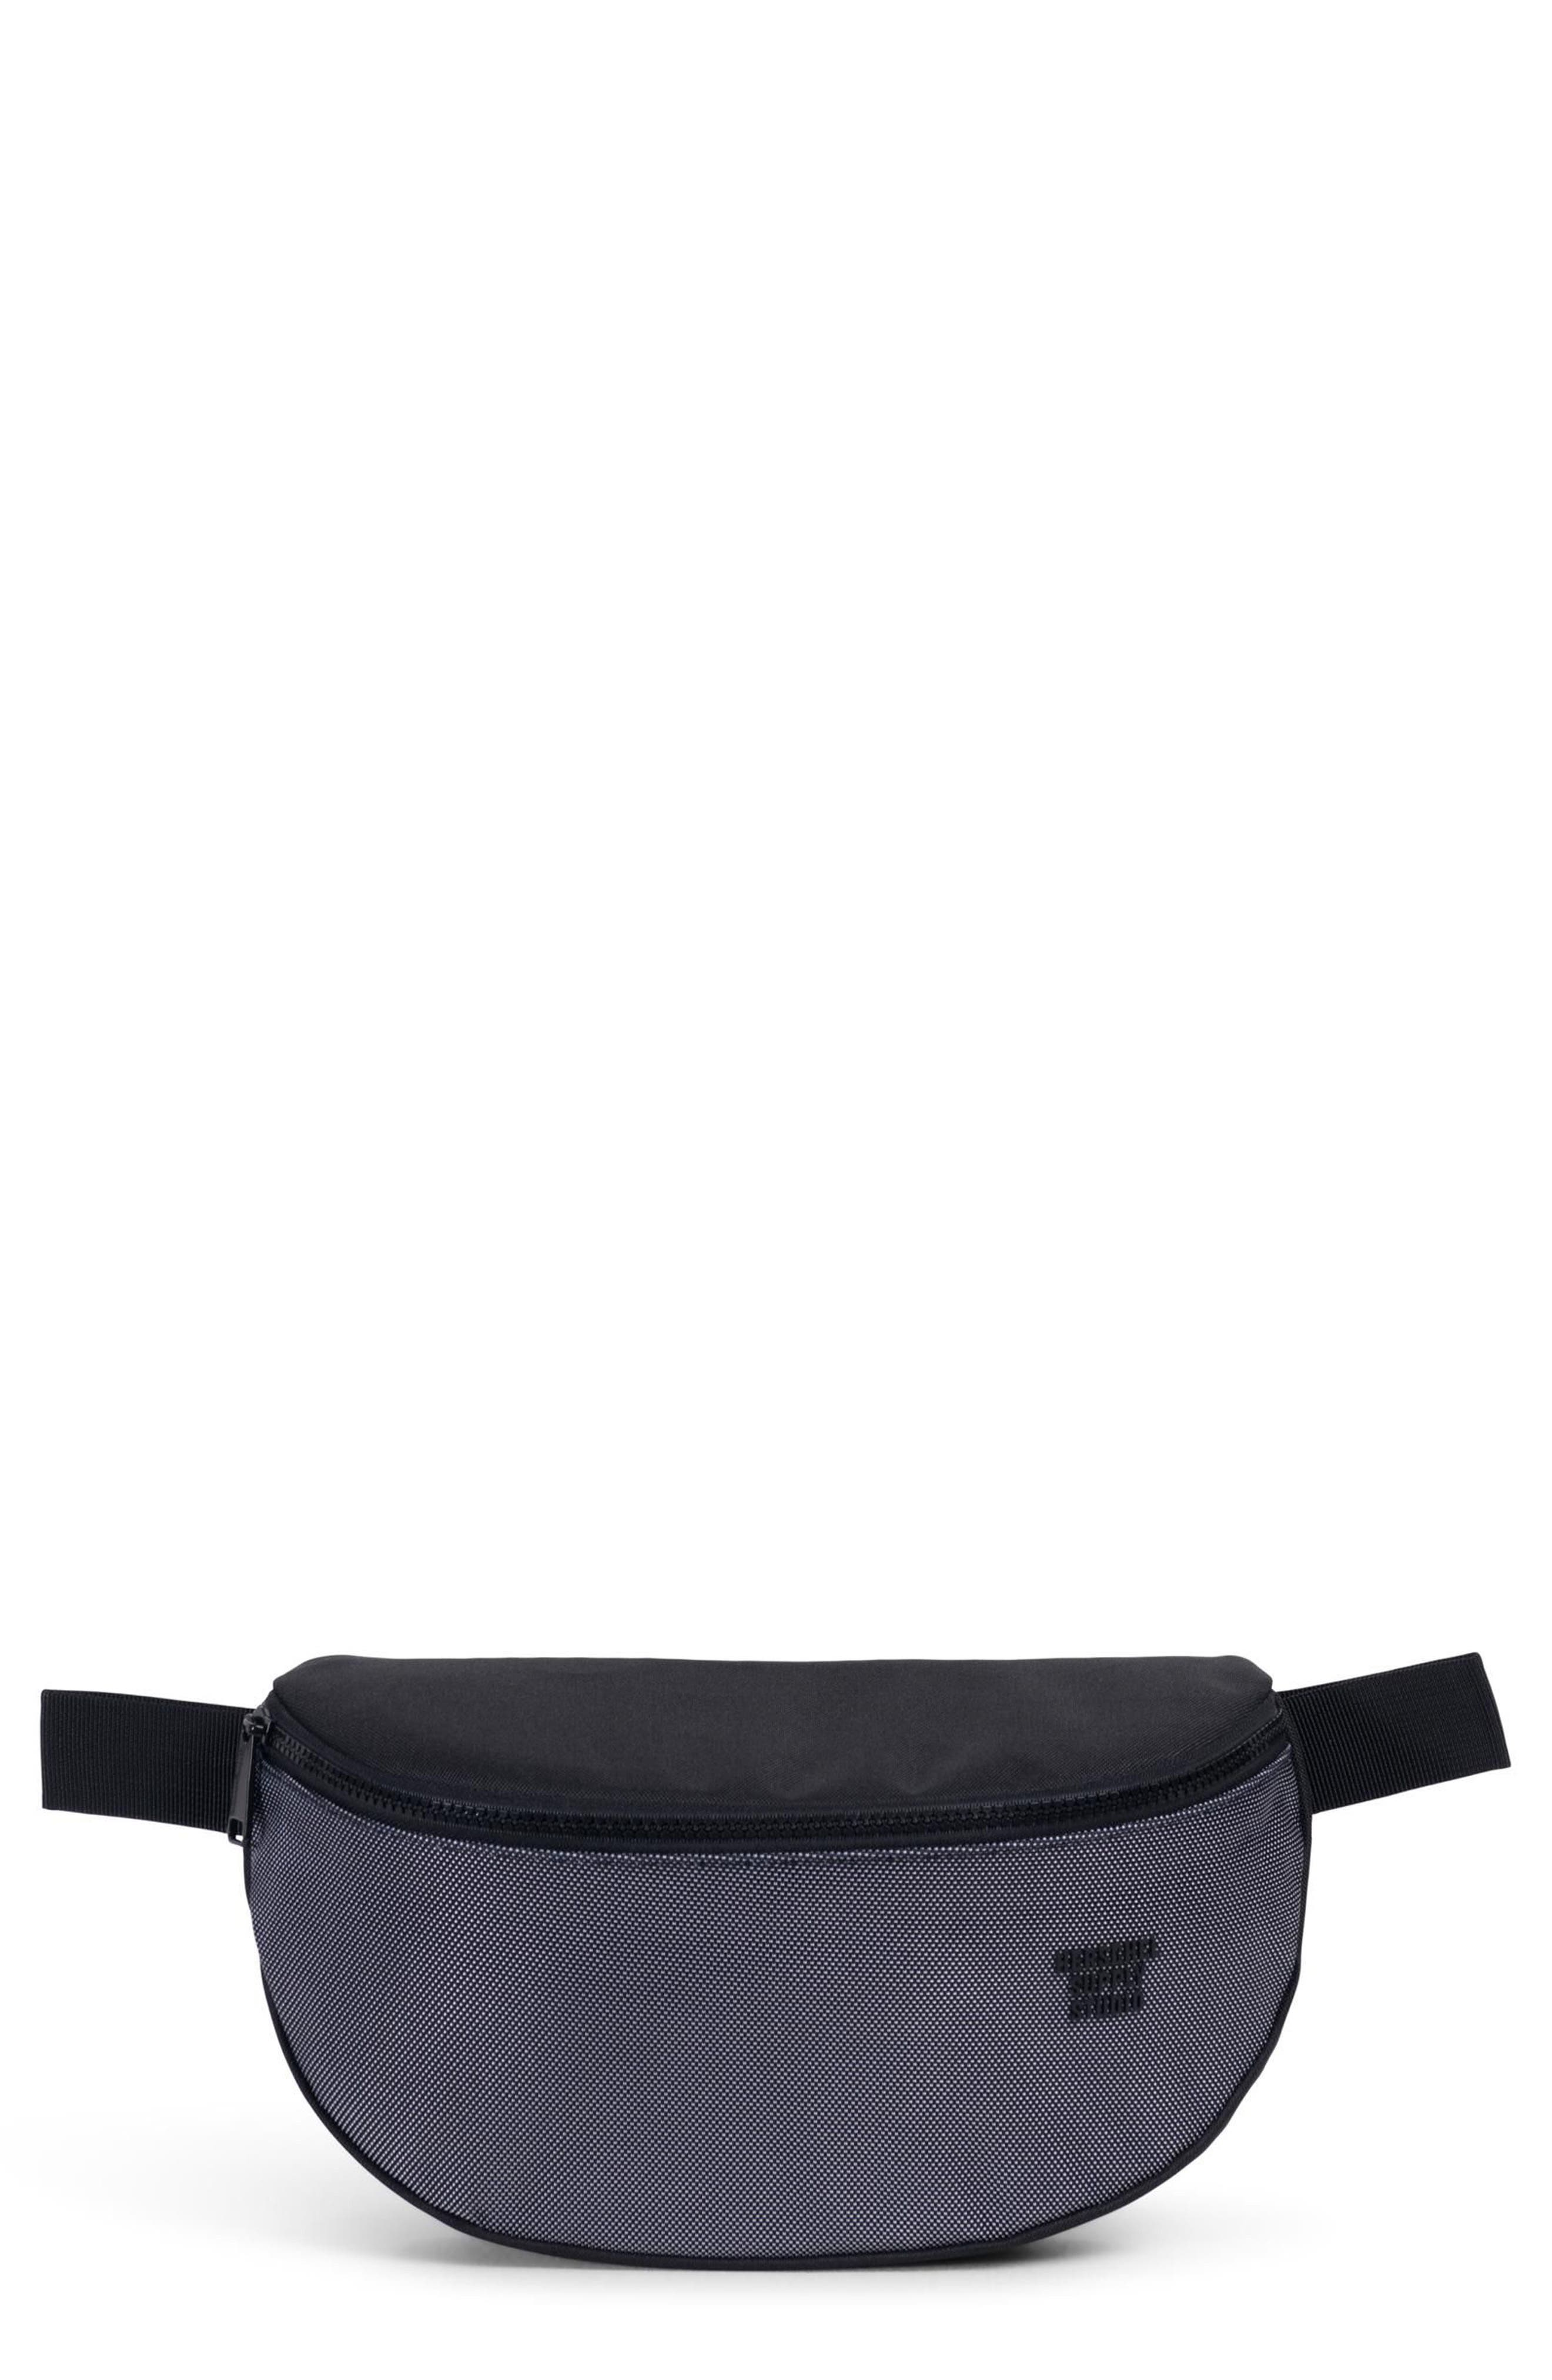 Sixteen Studio Belt Bag,                             Main thumbnail 1, color,                             BLACK